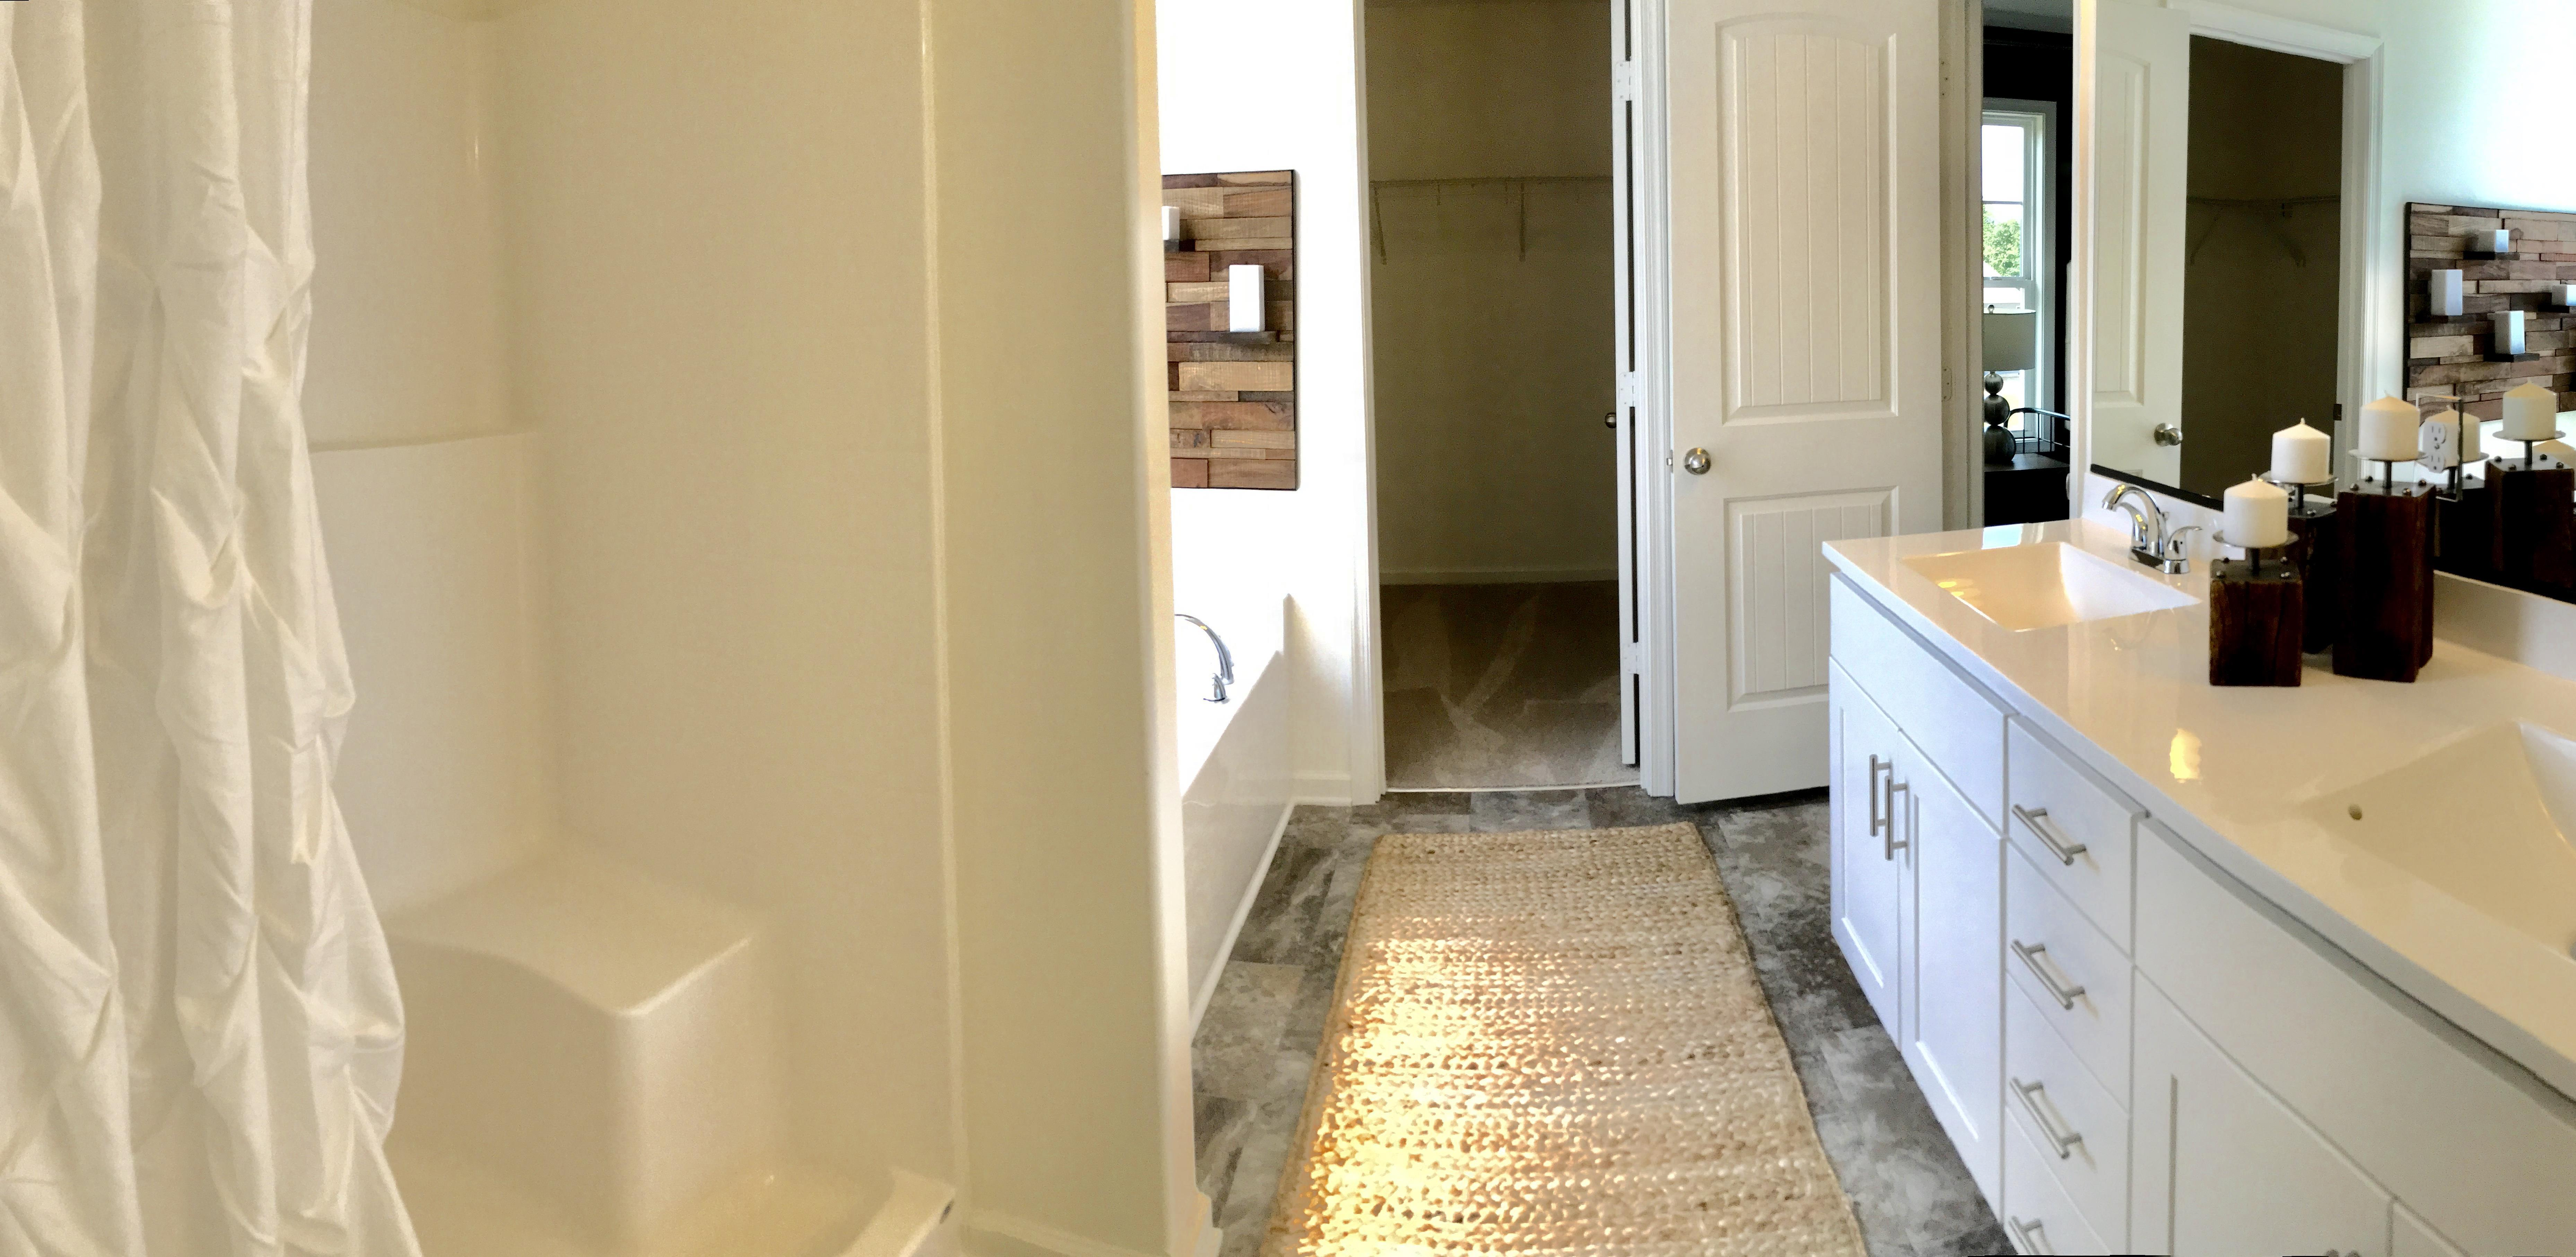 Bathroom featured in The Elmsted 4 Bedroom By Boyd Homes in Richmond-Petersburg, VA